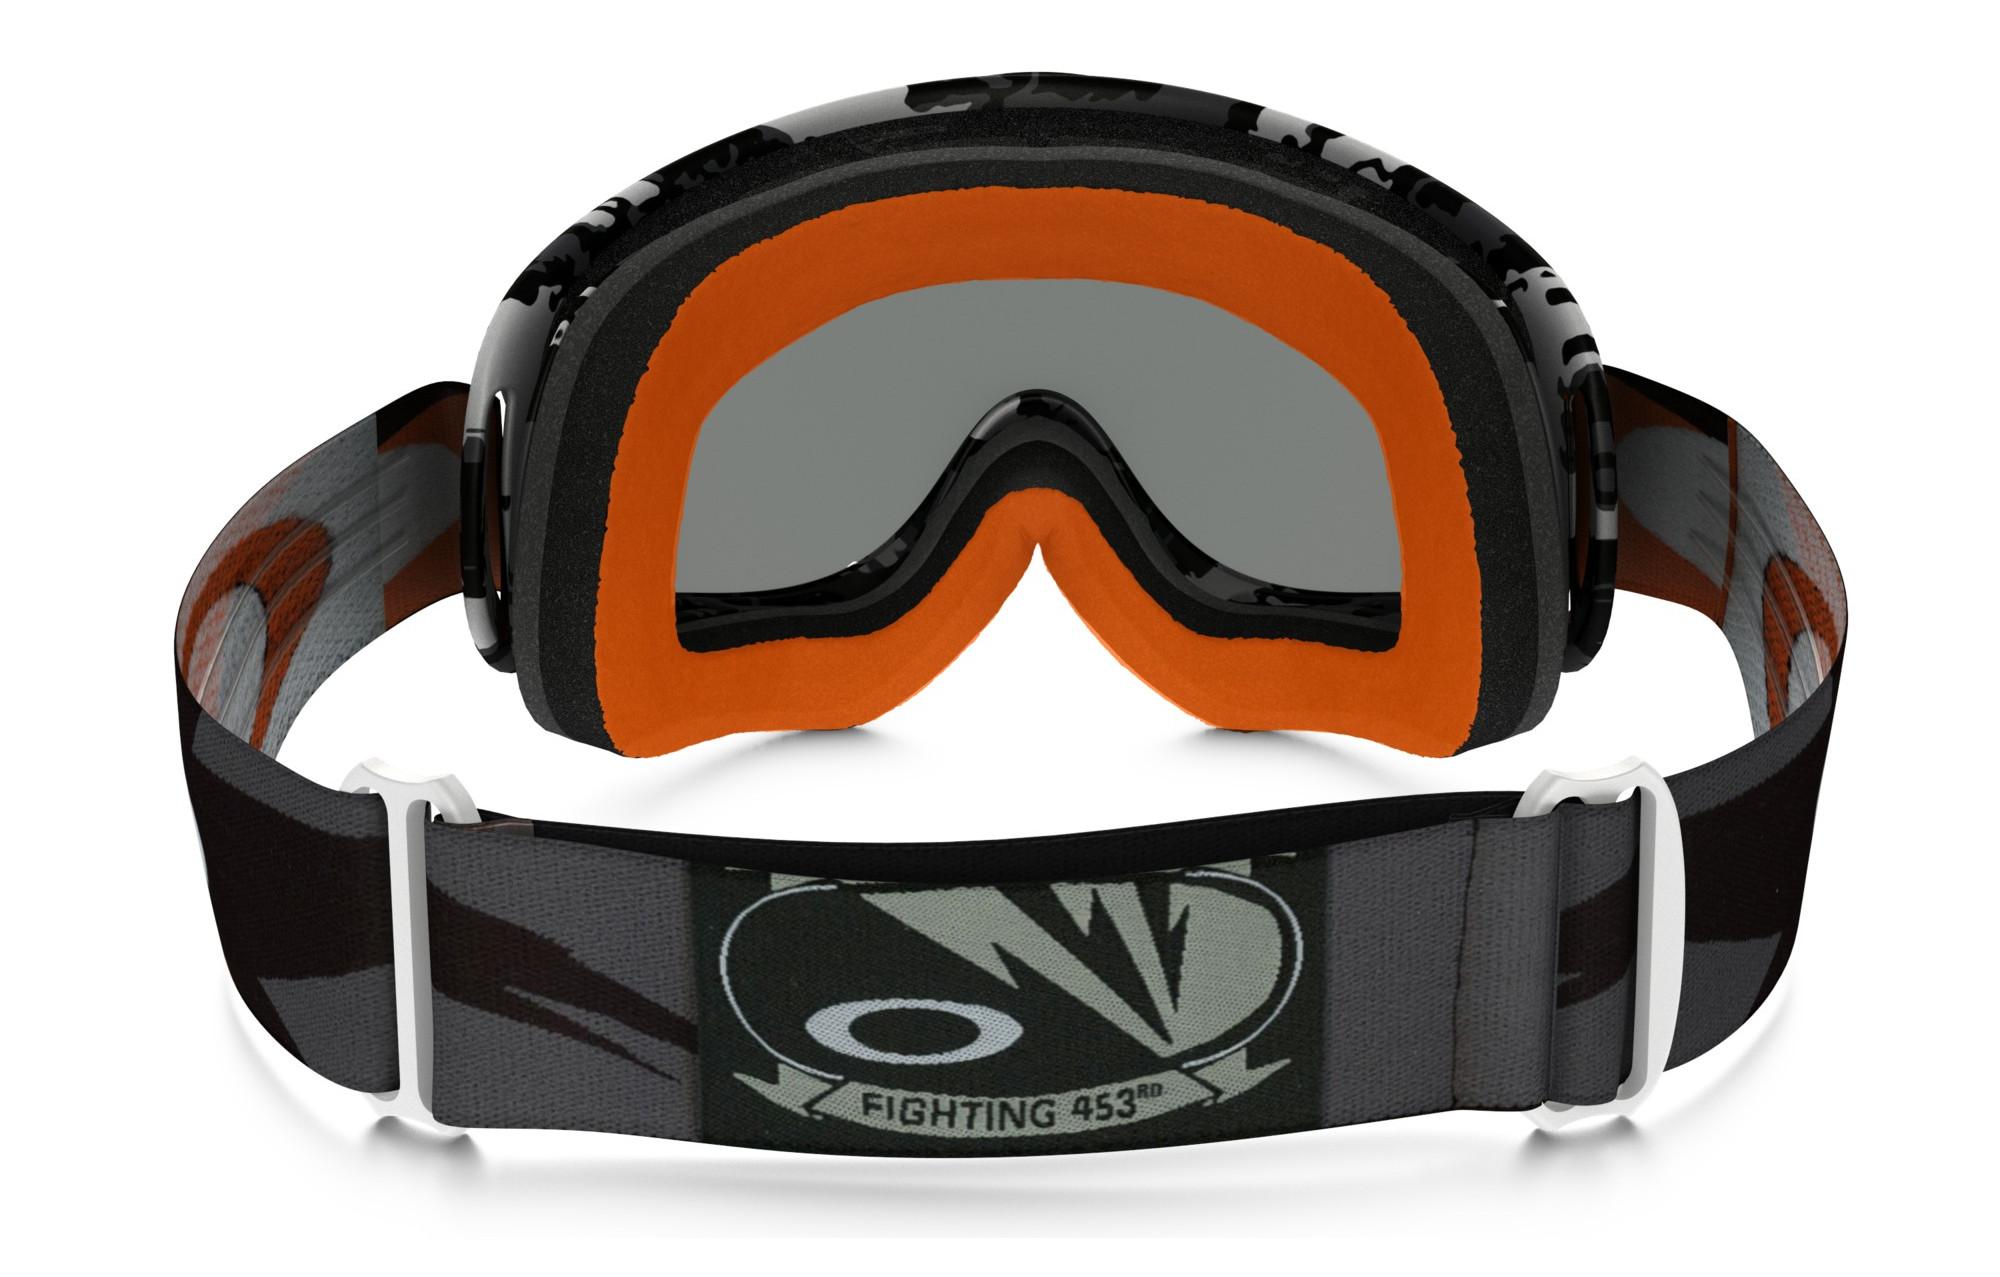 58ecee0789 OAKLEY O-FRAME MX FLIGHT SERIES Goggles Black - Grey Ref OO7029-24